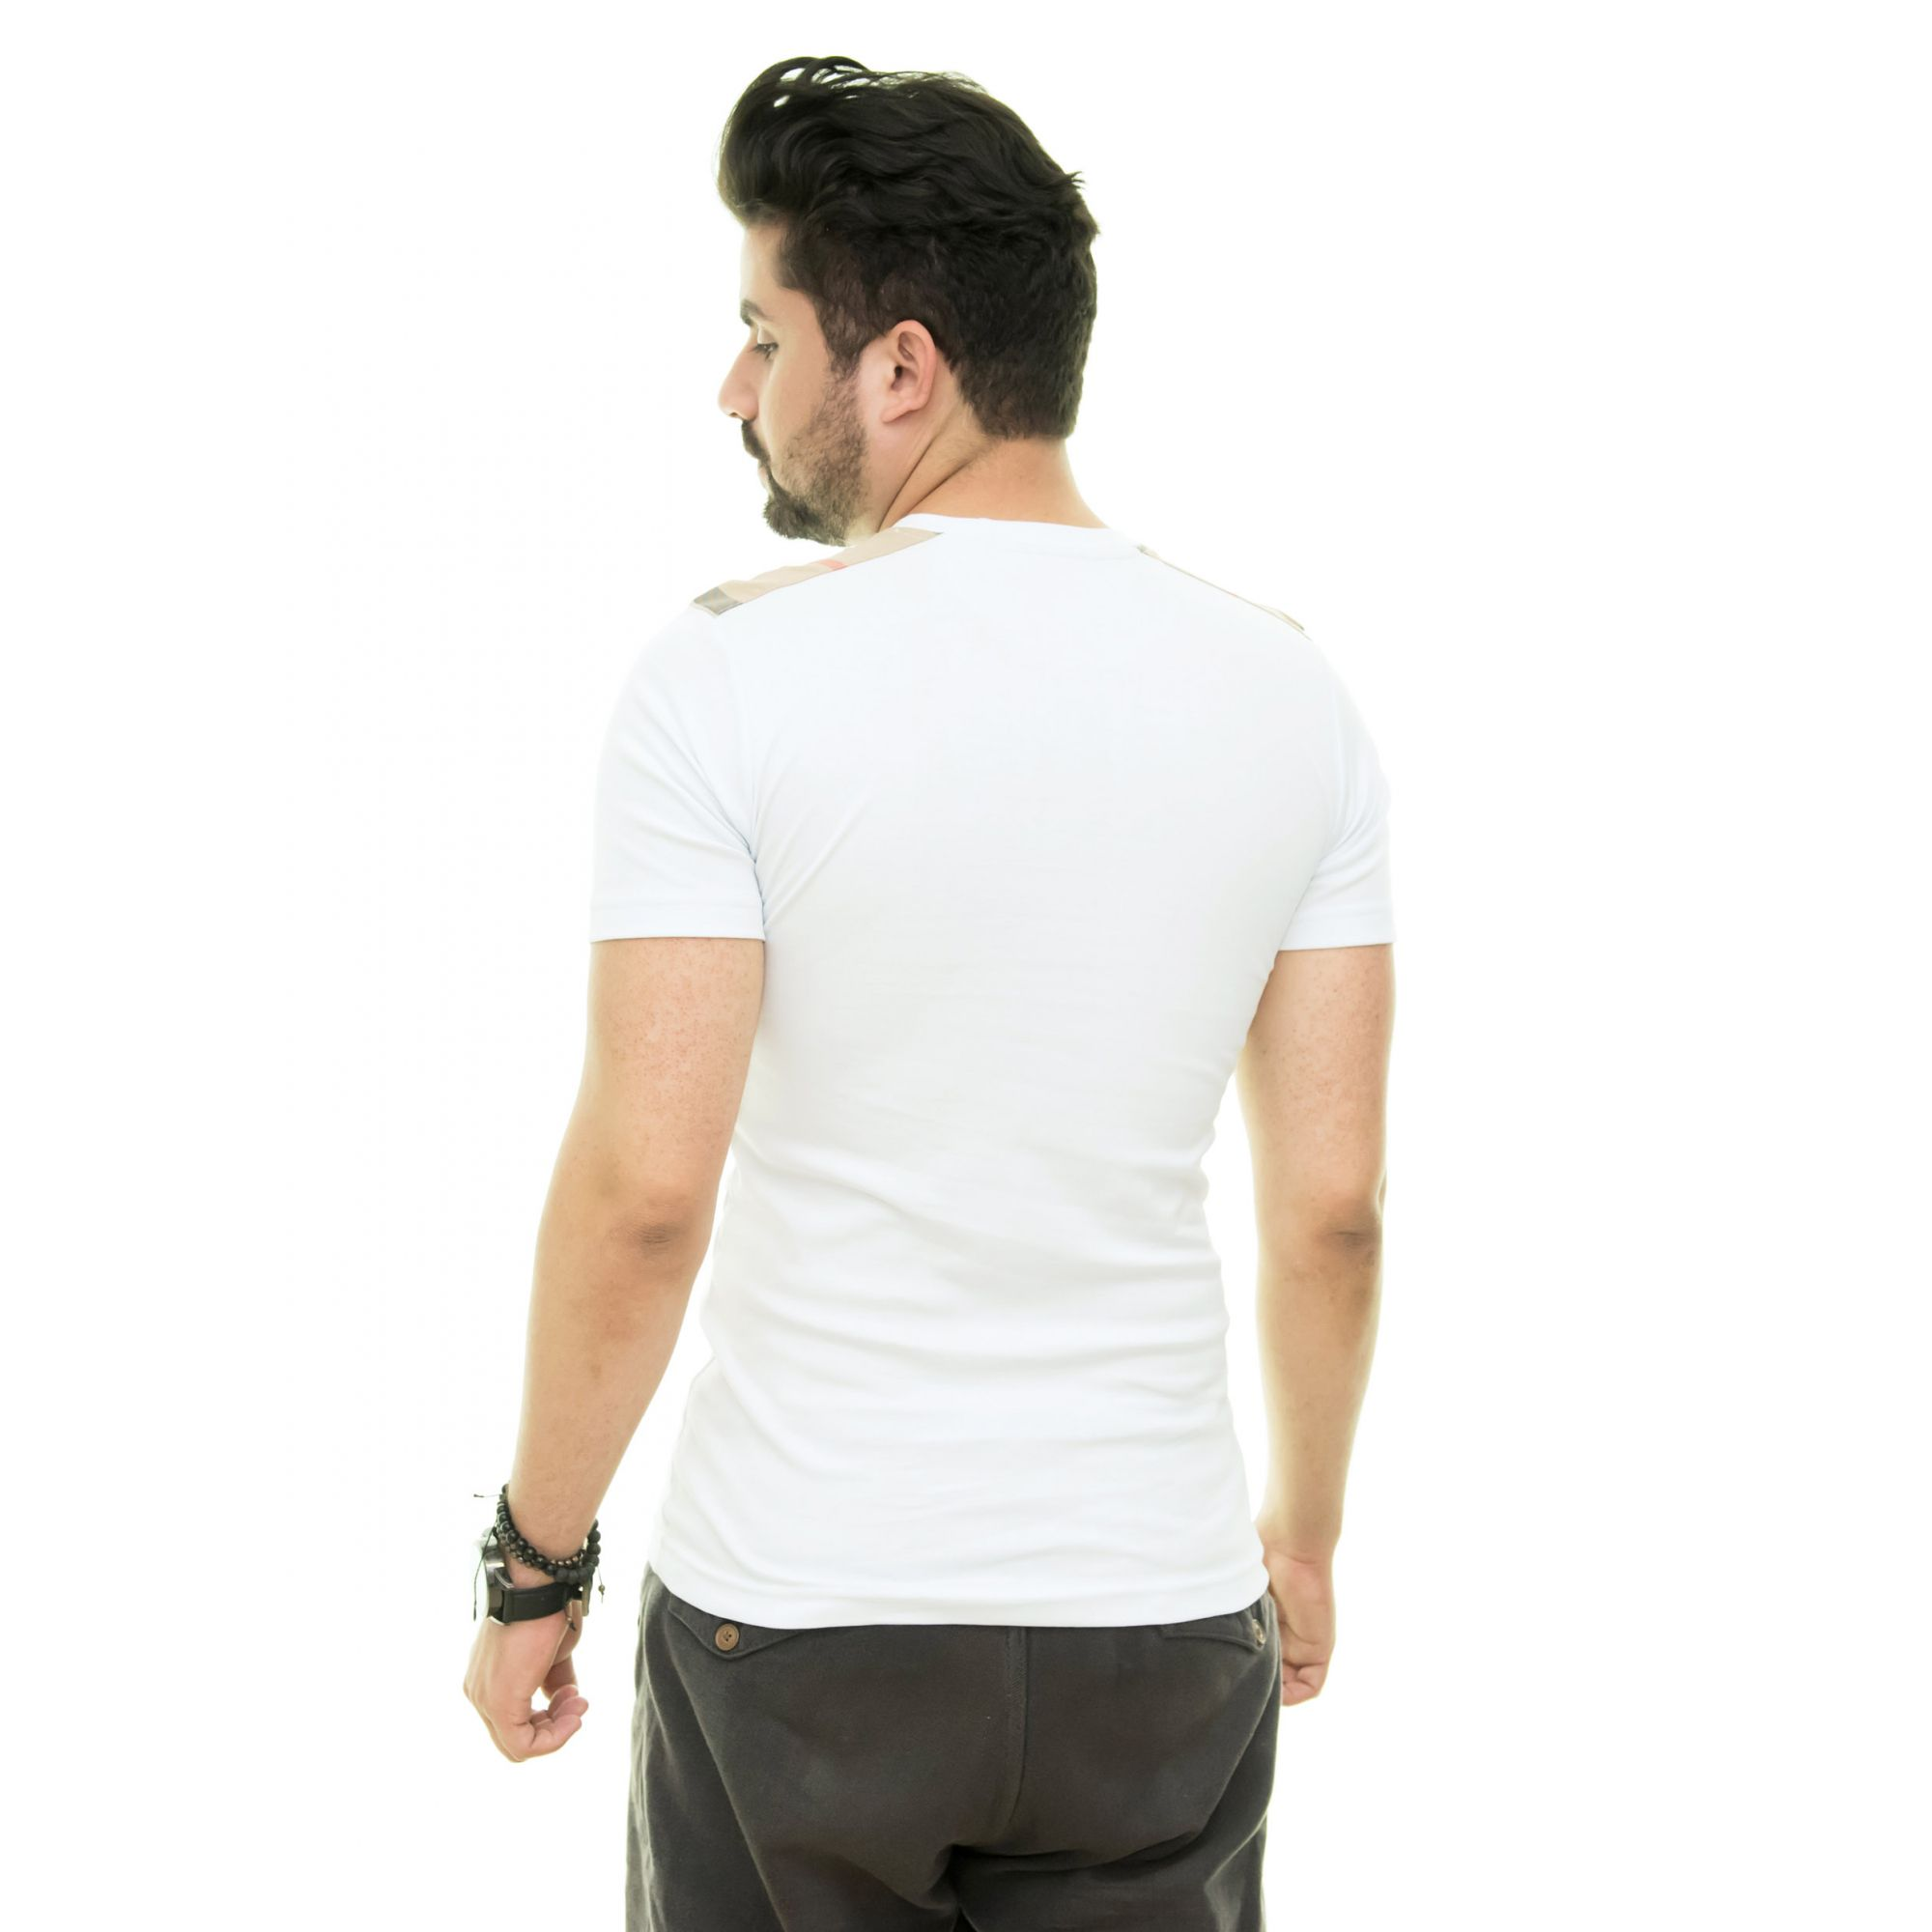 Camiseta Brb-03 Branca  - Ca Brasileira